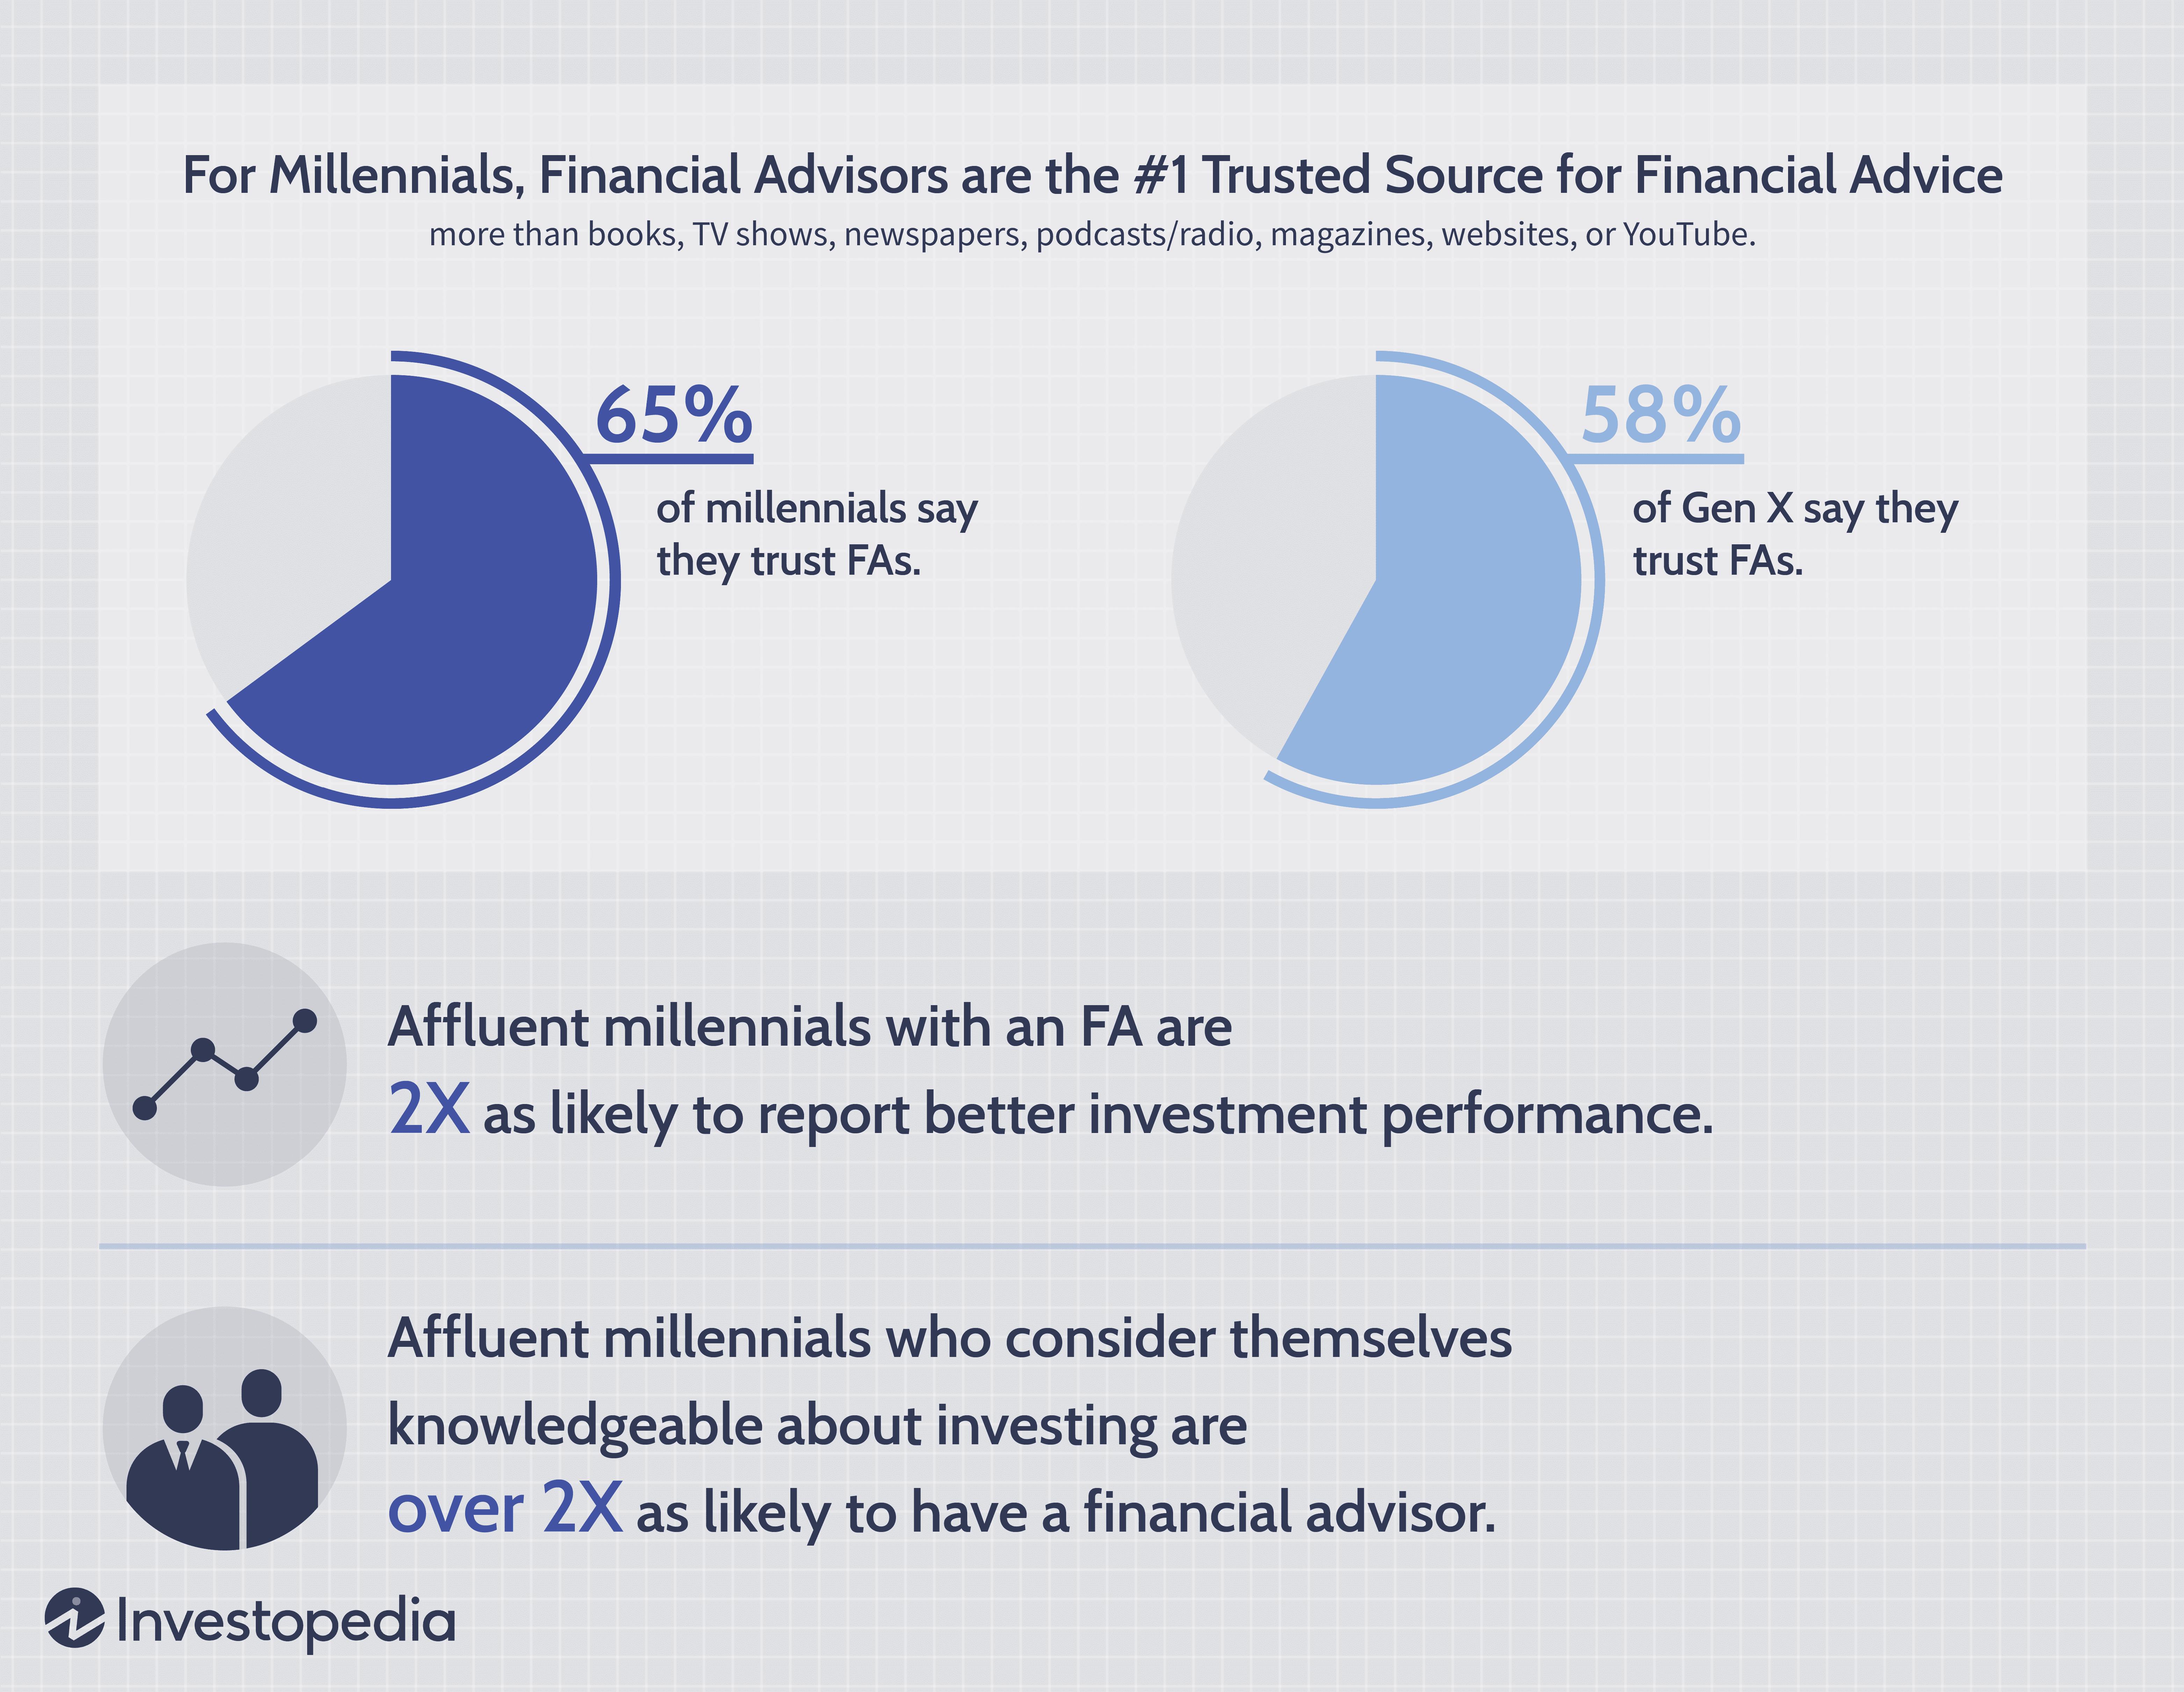 Investopedia Affluent Millennial Investing Study: Financial Advisors